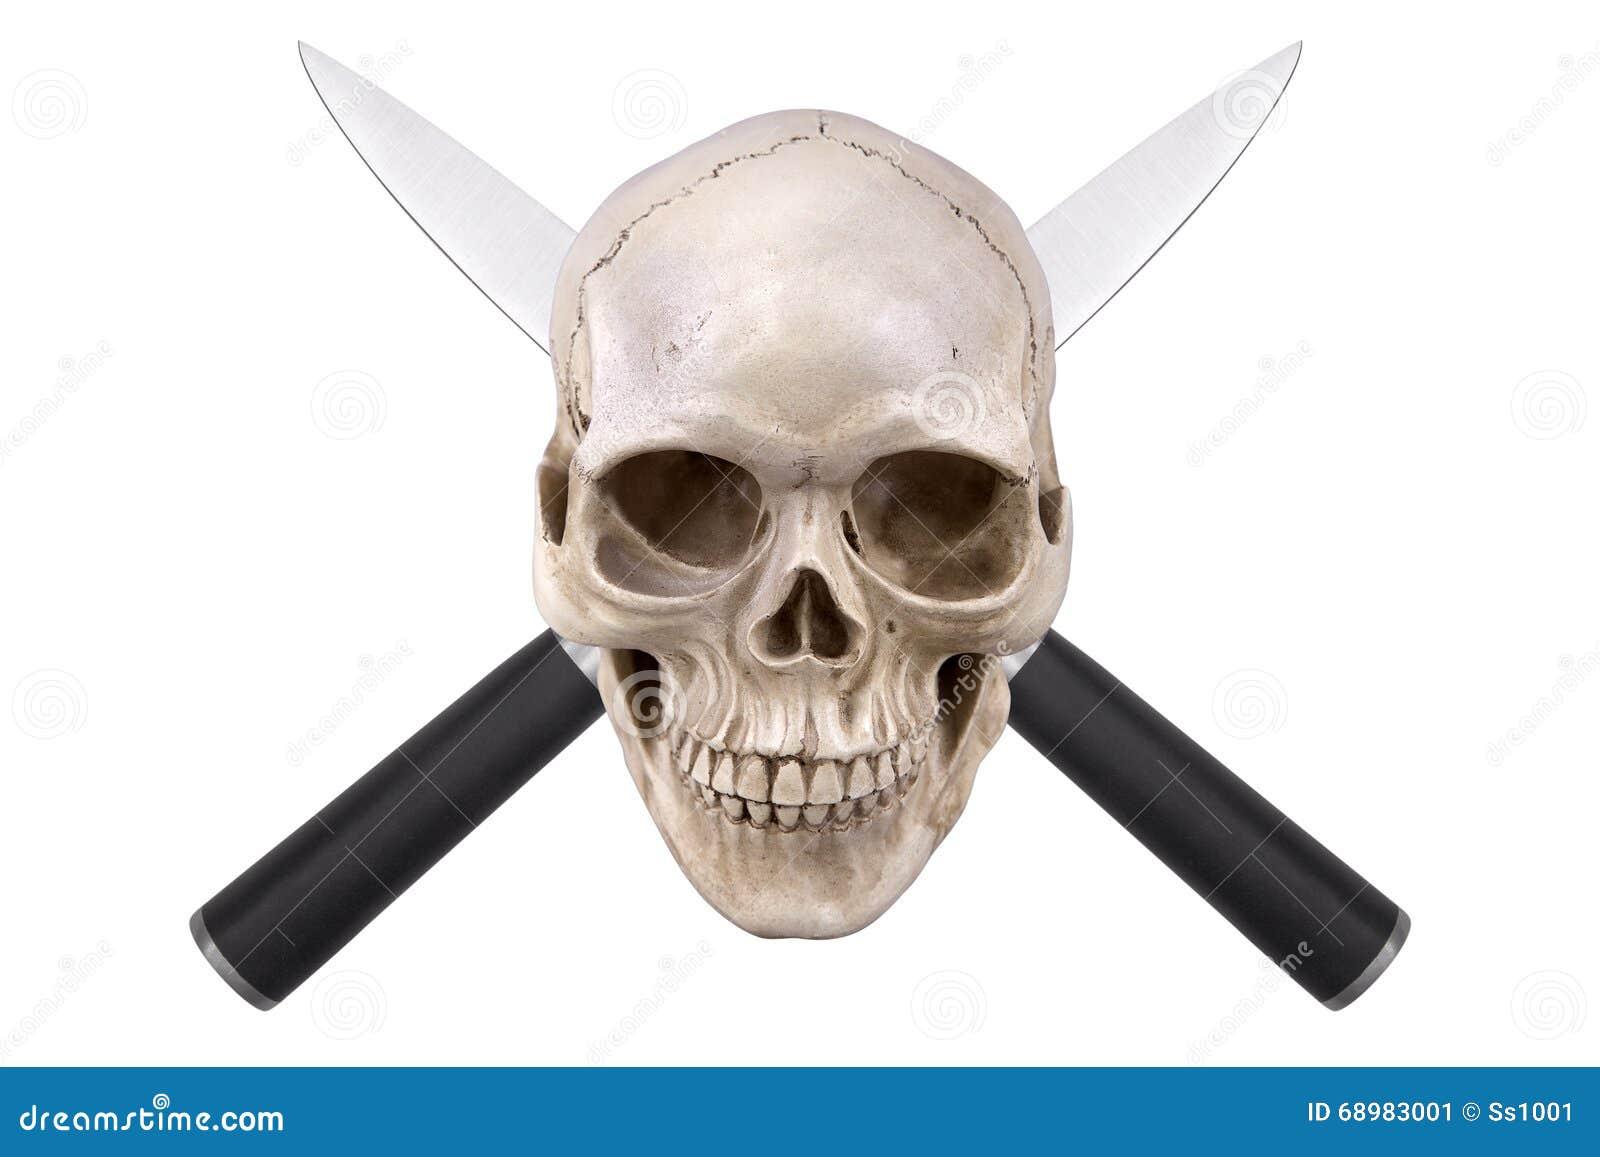 Cráneo con dos cuchillos cruzados